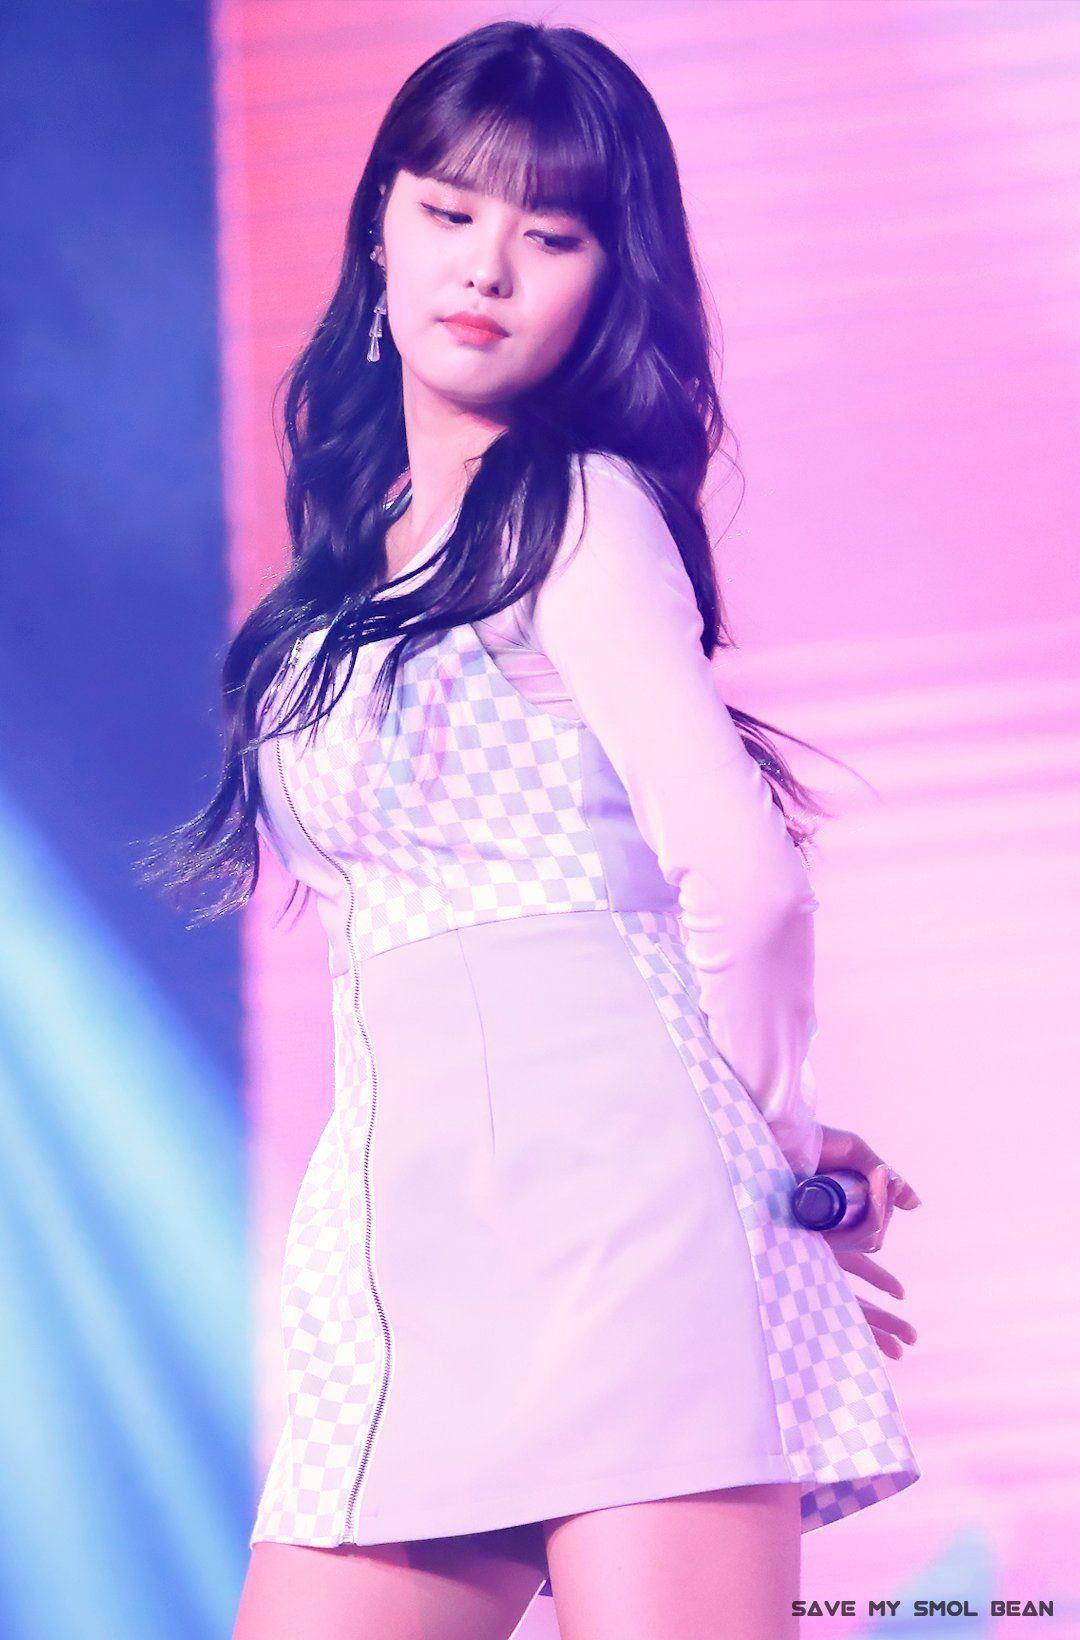 Pin by btsarmyzona on kpop beauty Kpop idol, Kpop